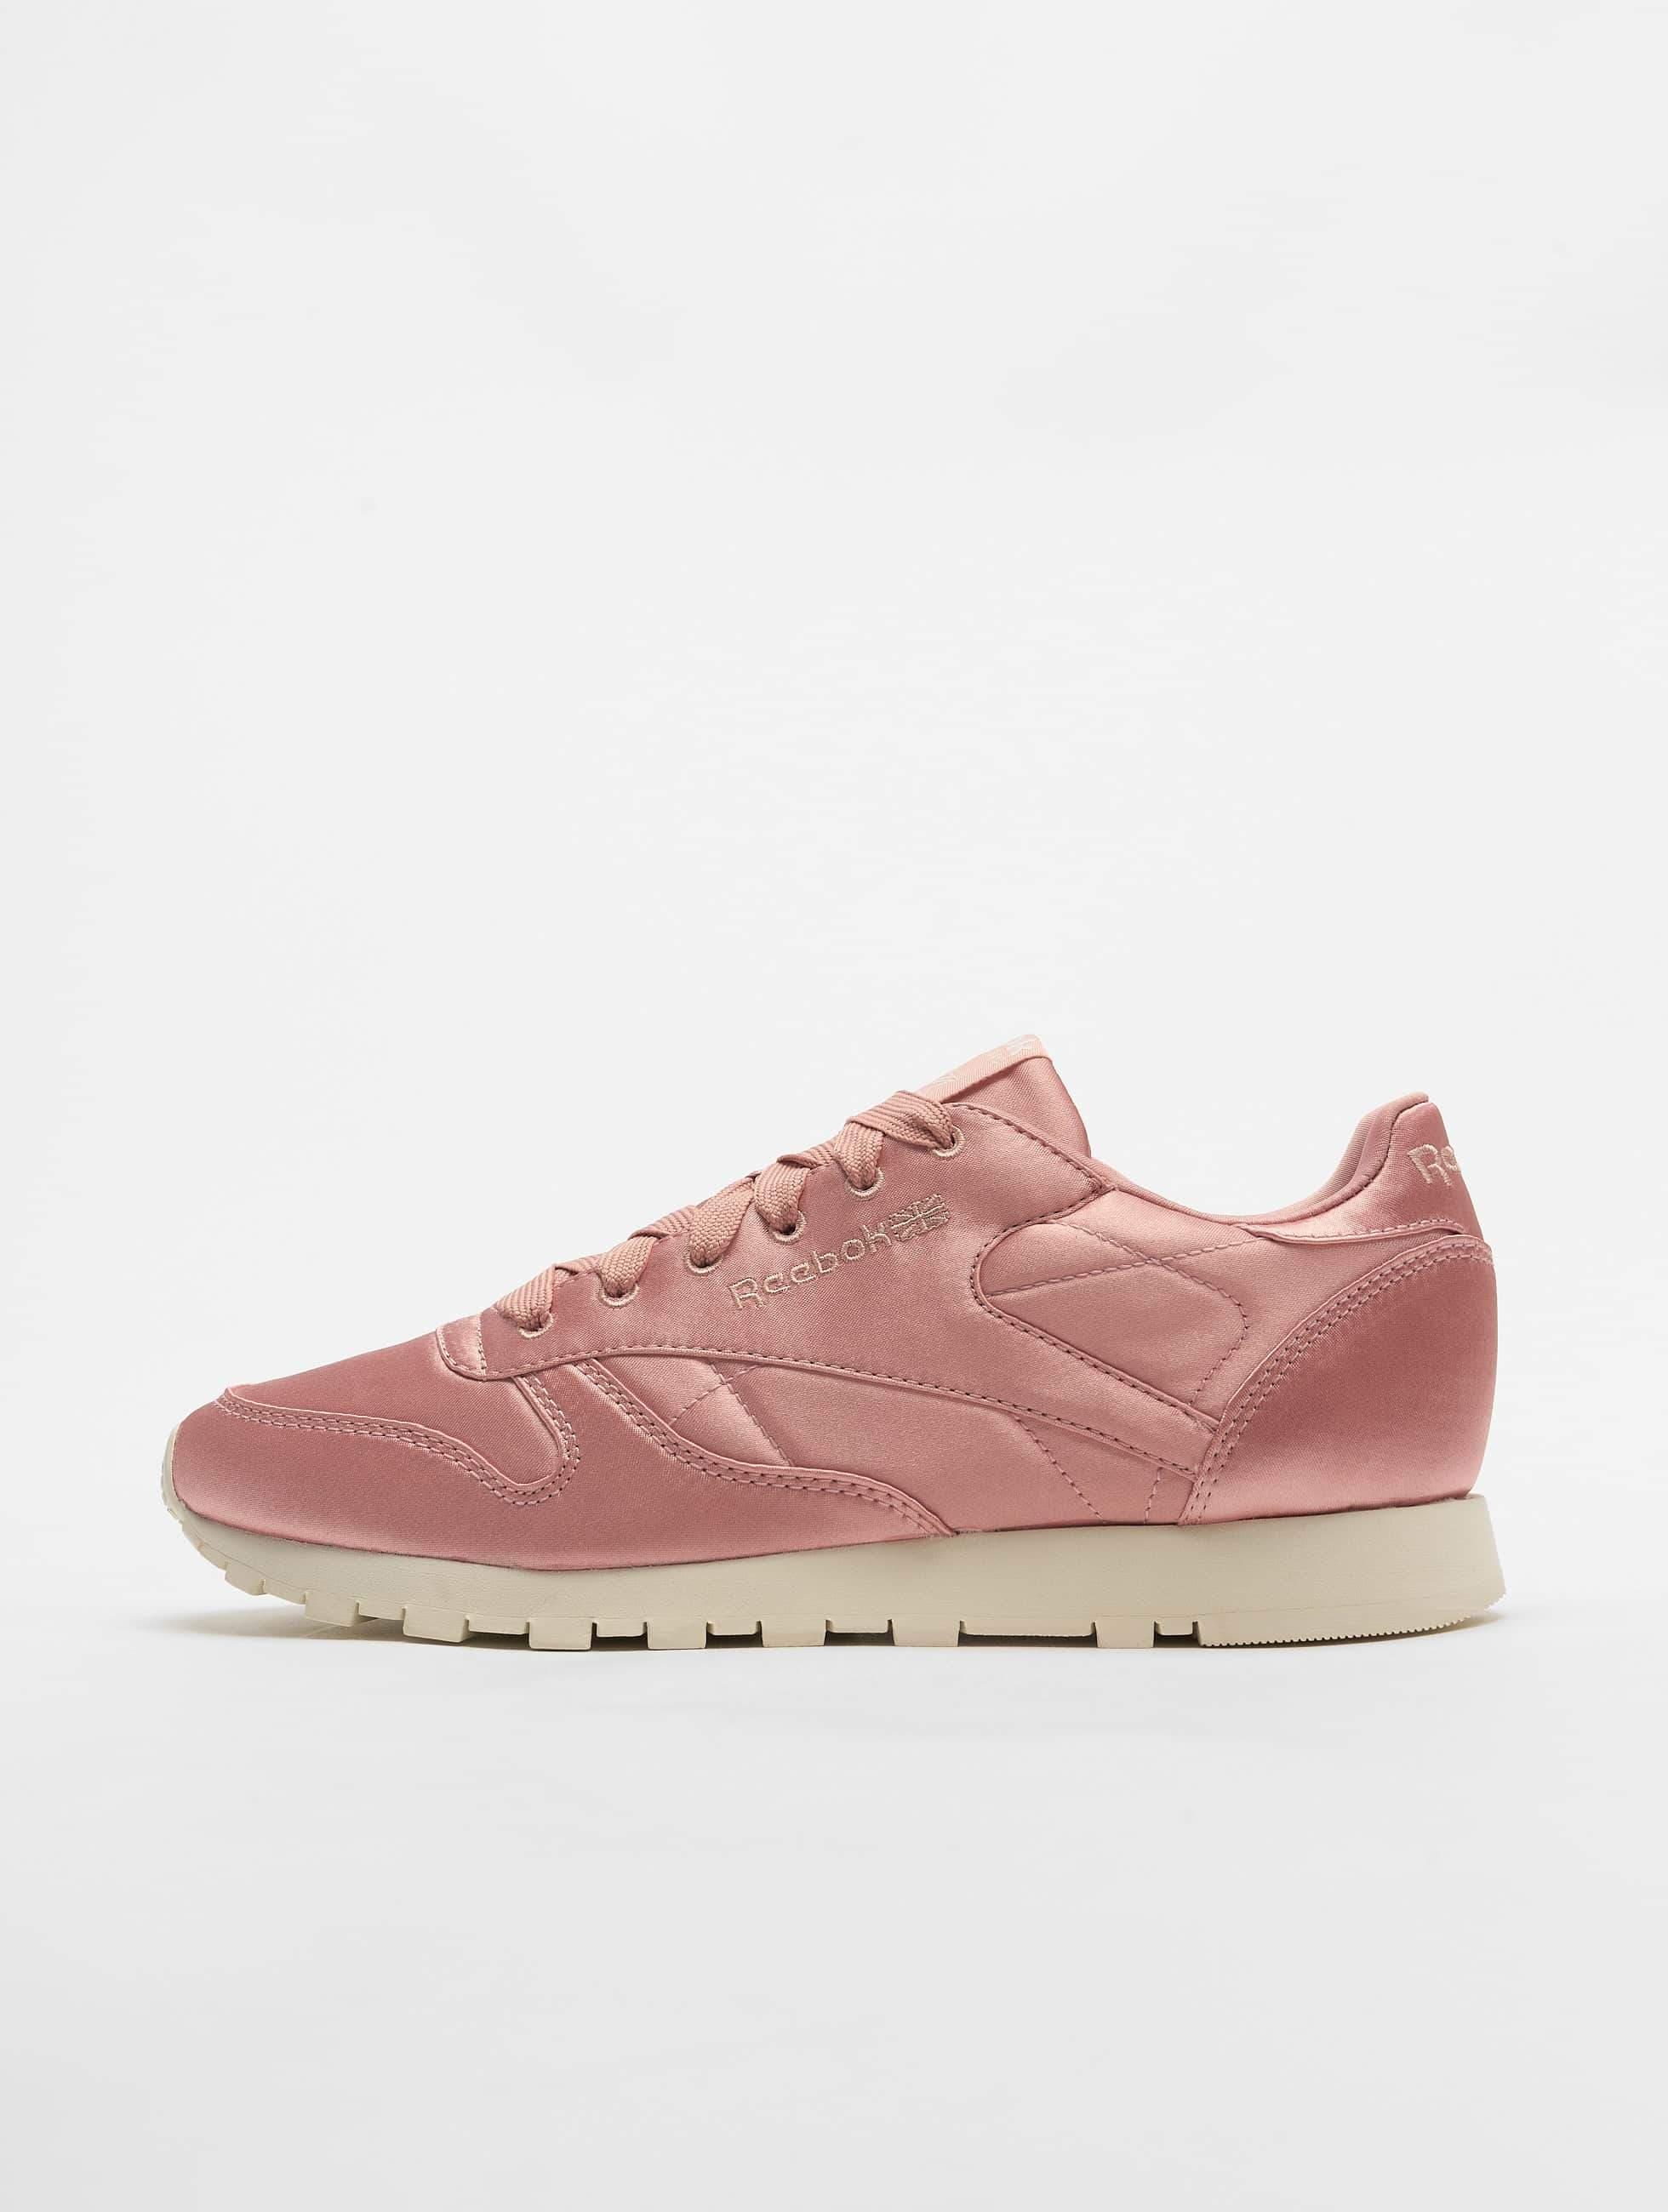 Reebok Classic Leather Satin Sneakers Chalk PinkClassic White